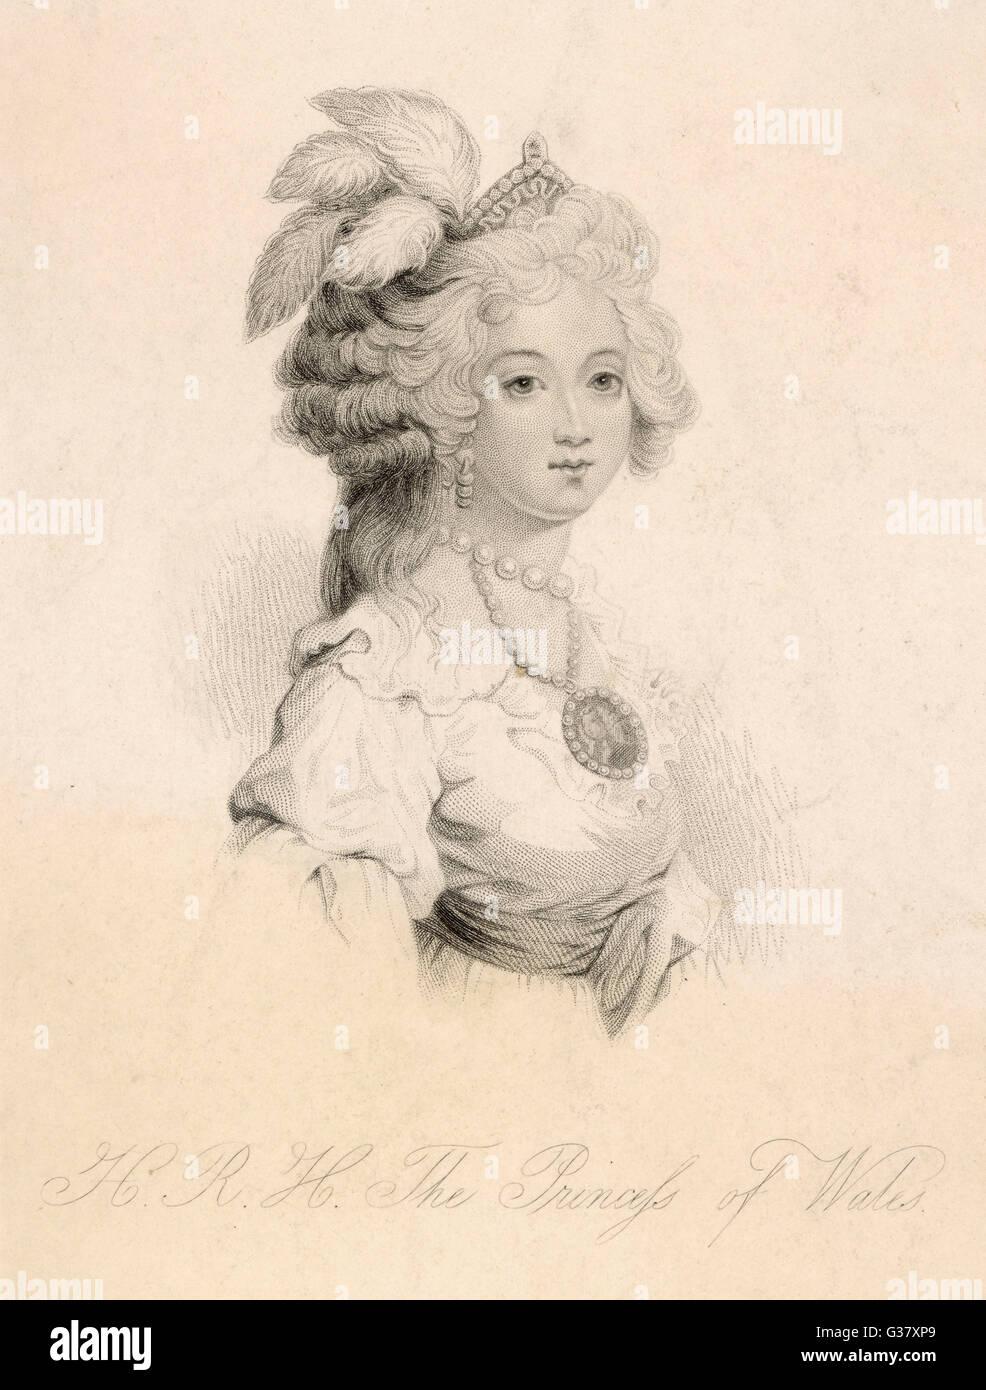 Caroline of Brunswick(1768-1821), wife of George IV.     Date: 1839 - Stock Image